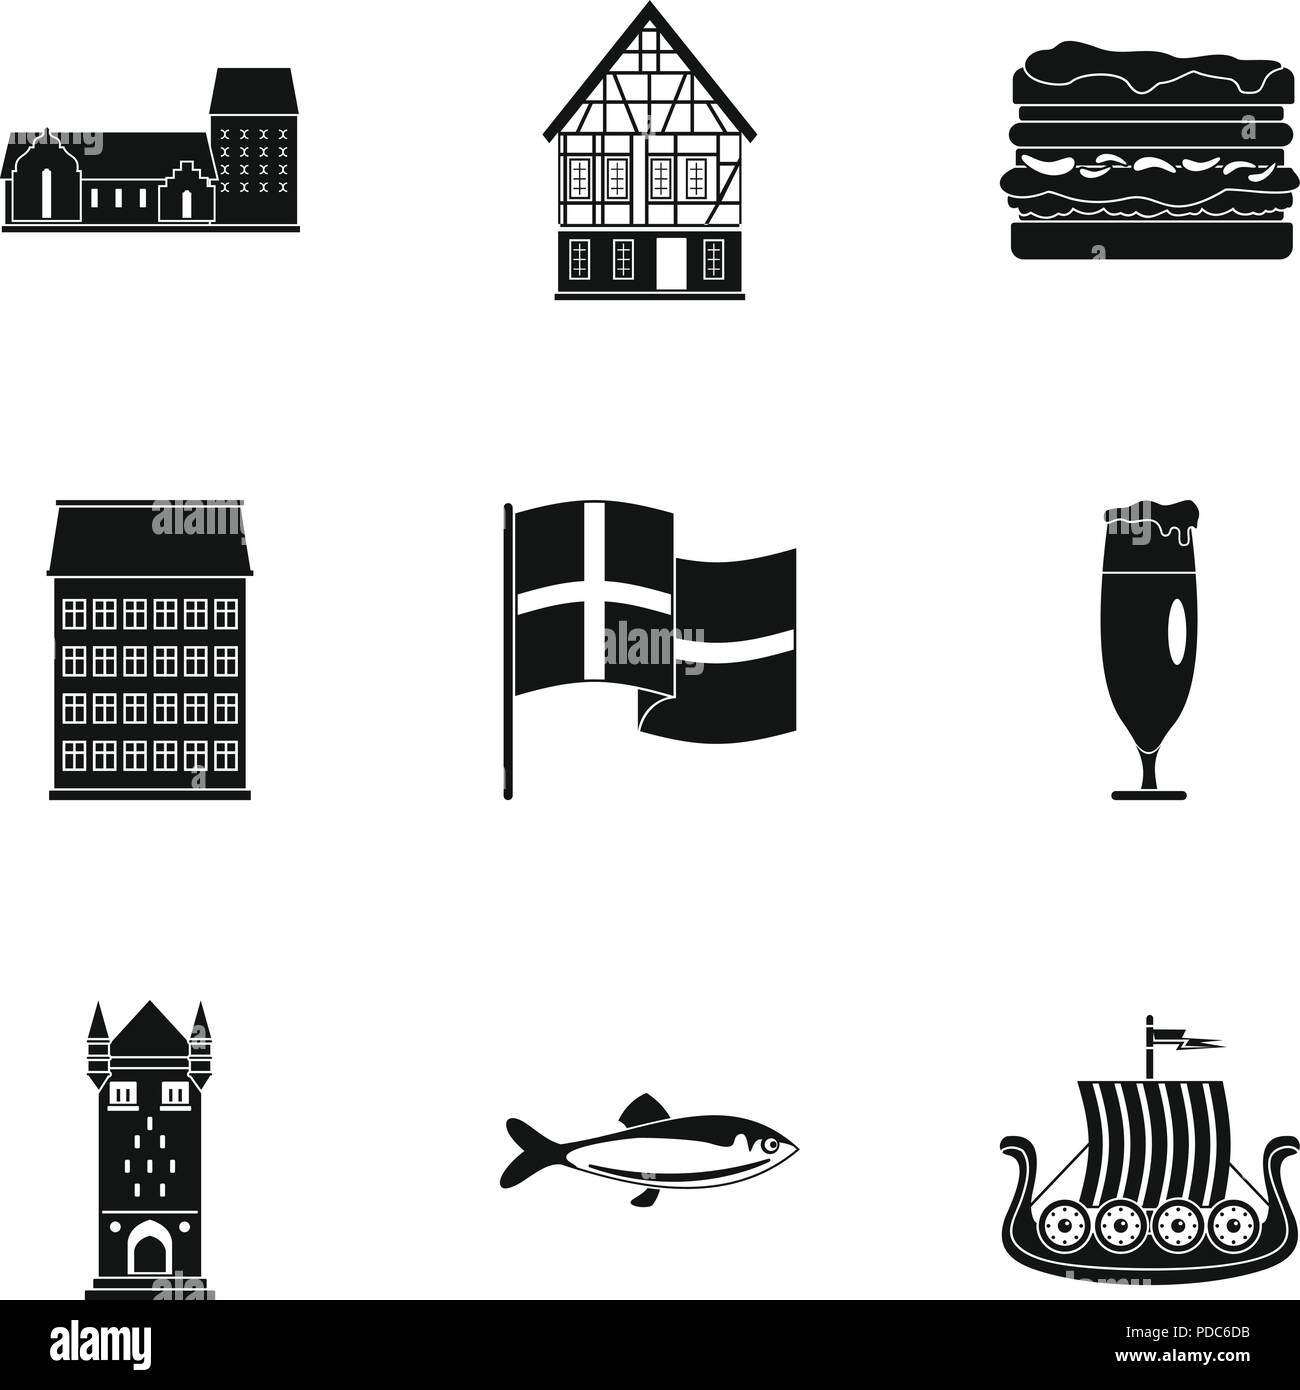 Hinterland icons set, simple style - Stock Image